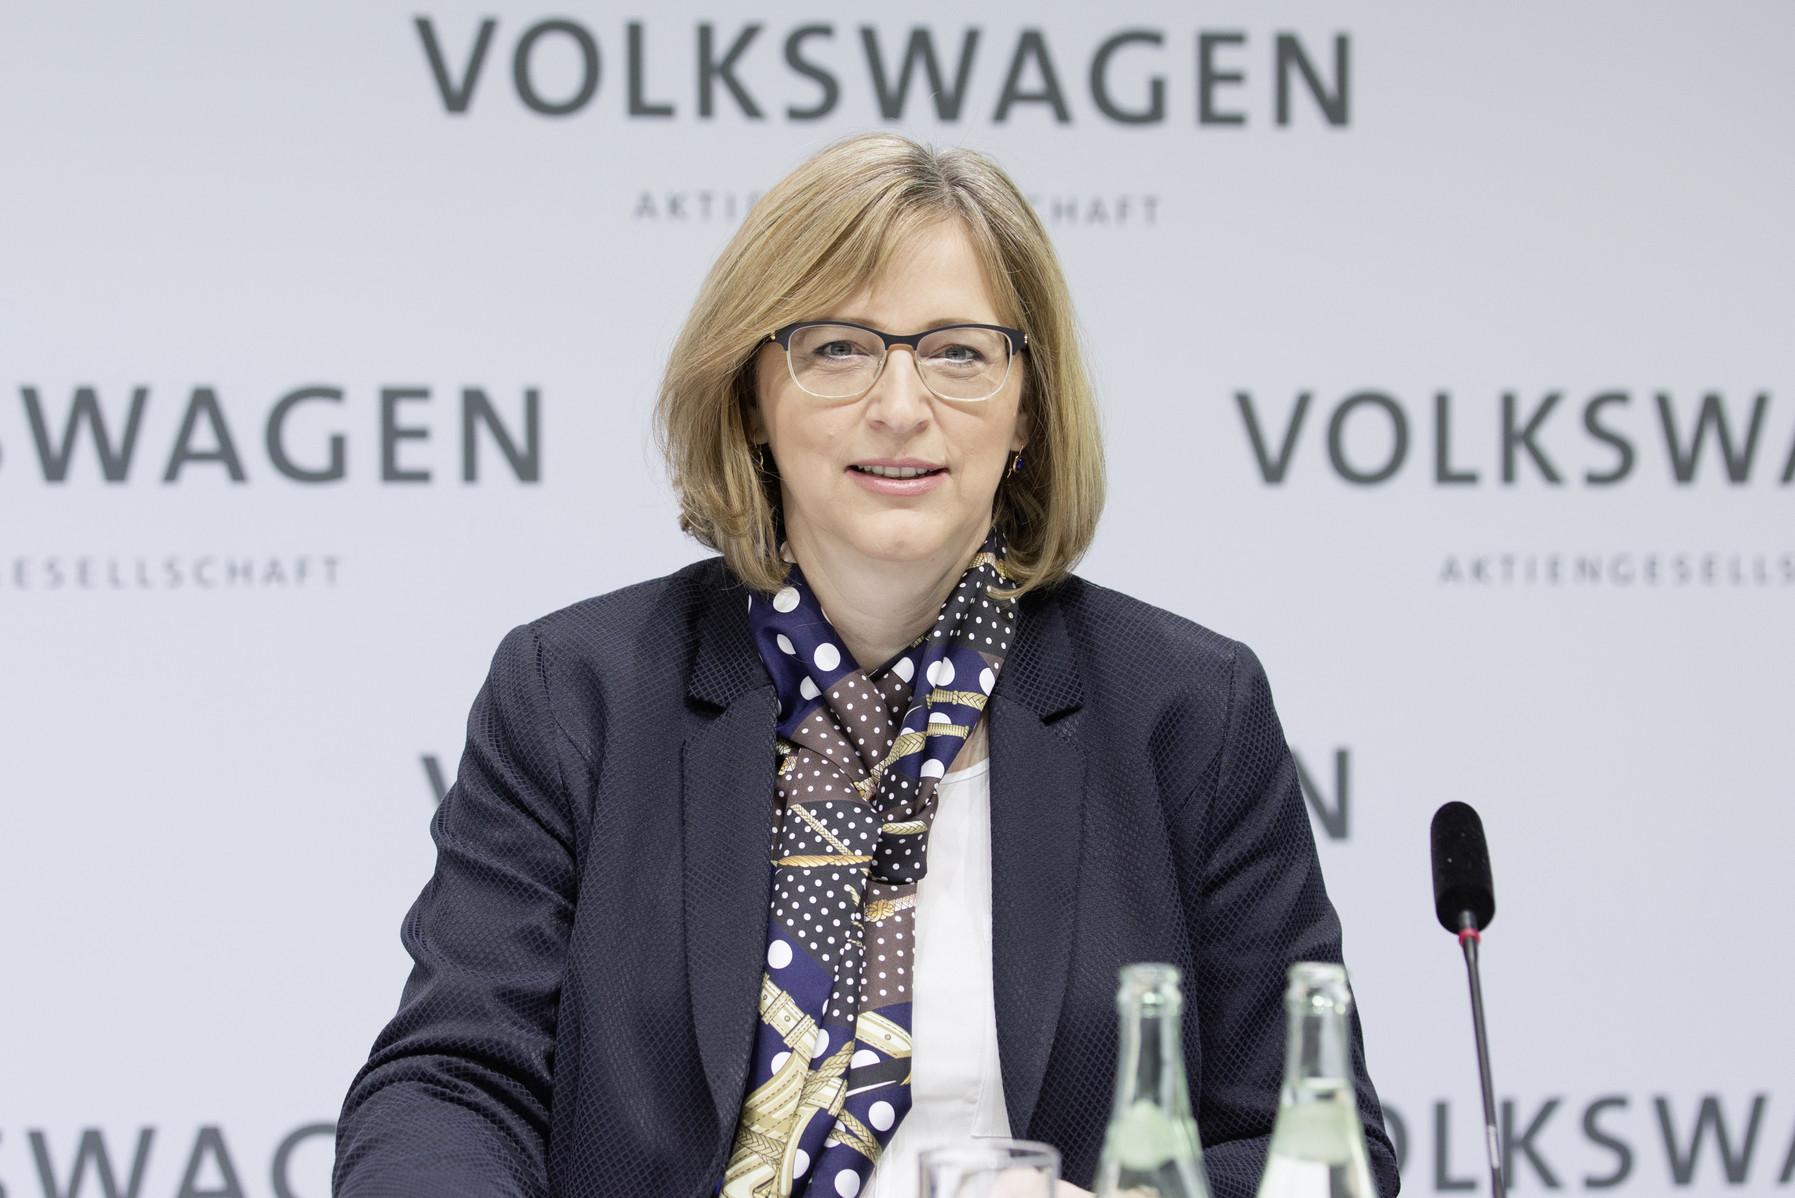 028. Hiltrud Werner: From Shock – to Shame – to Change